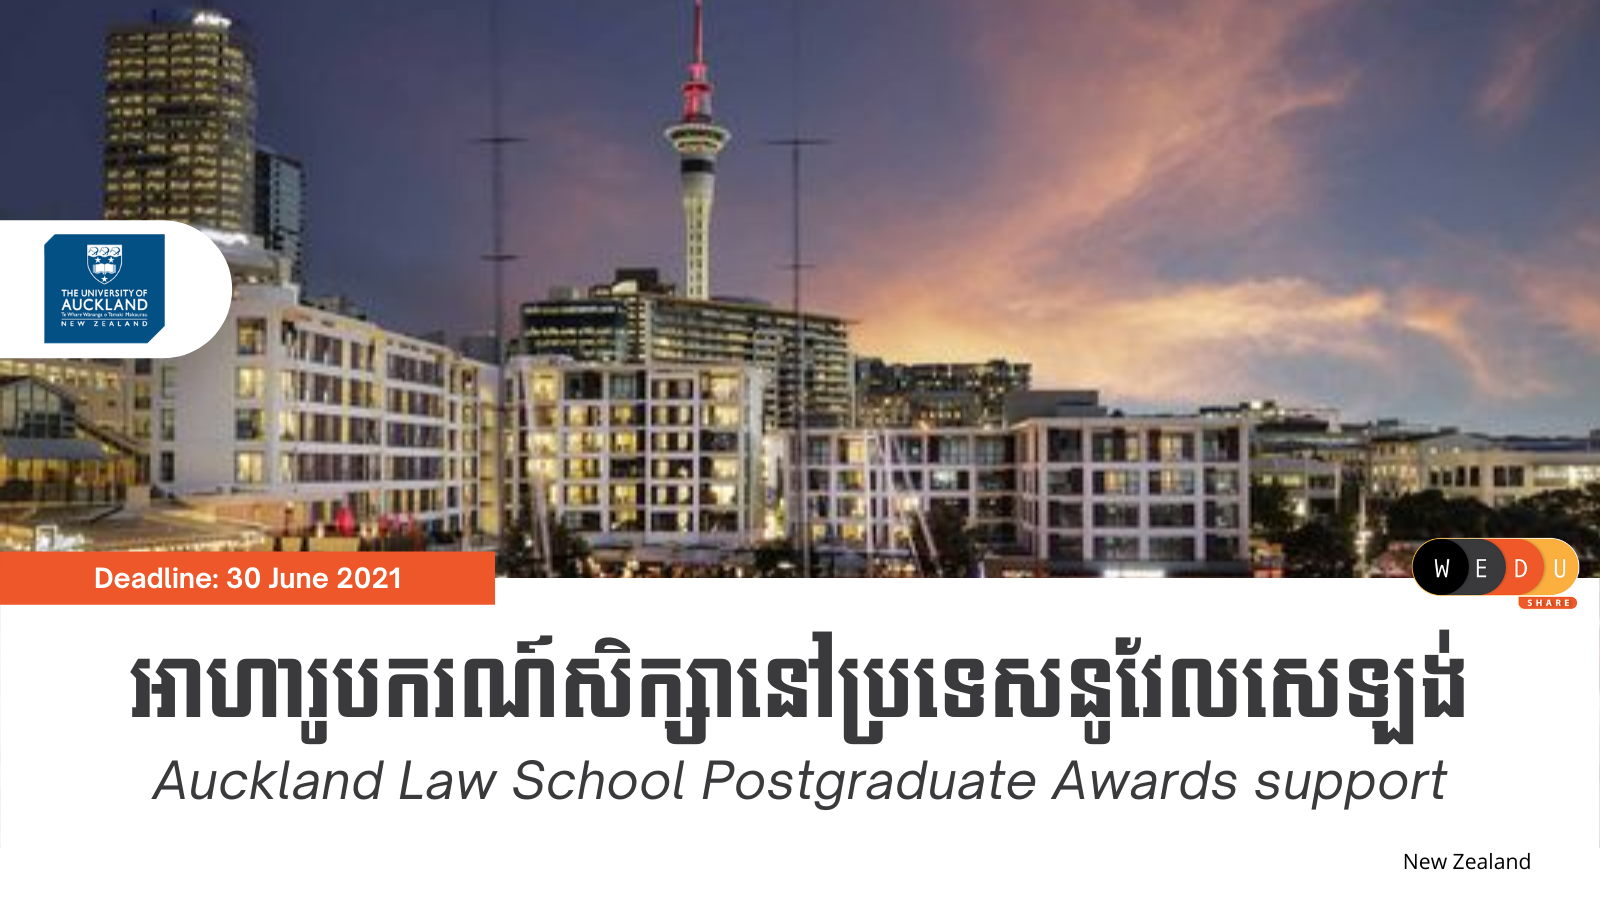 Auckland Law School Postgraduate Awards support